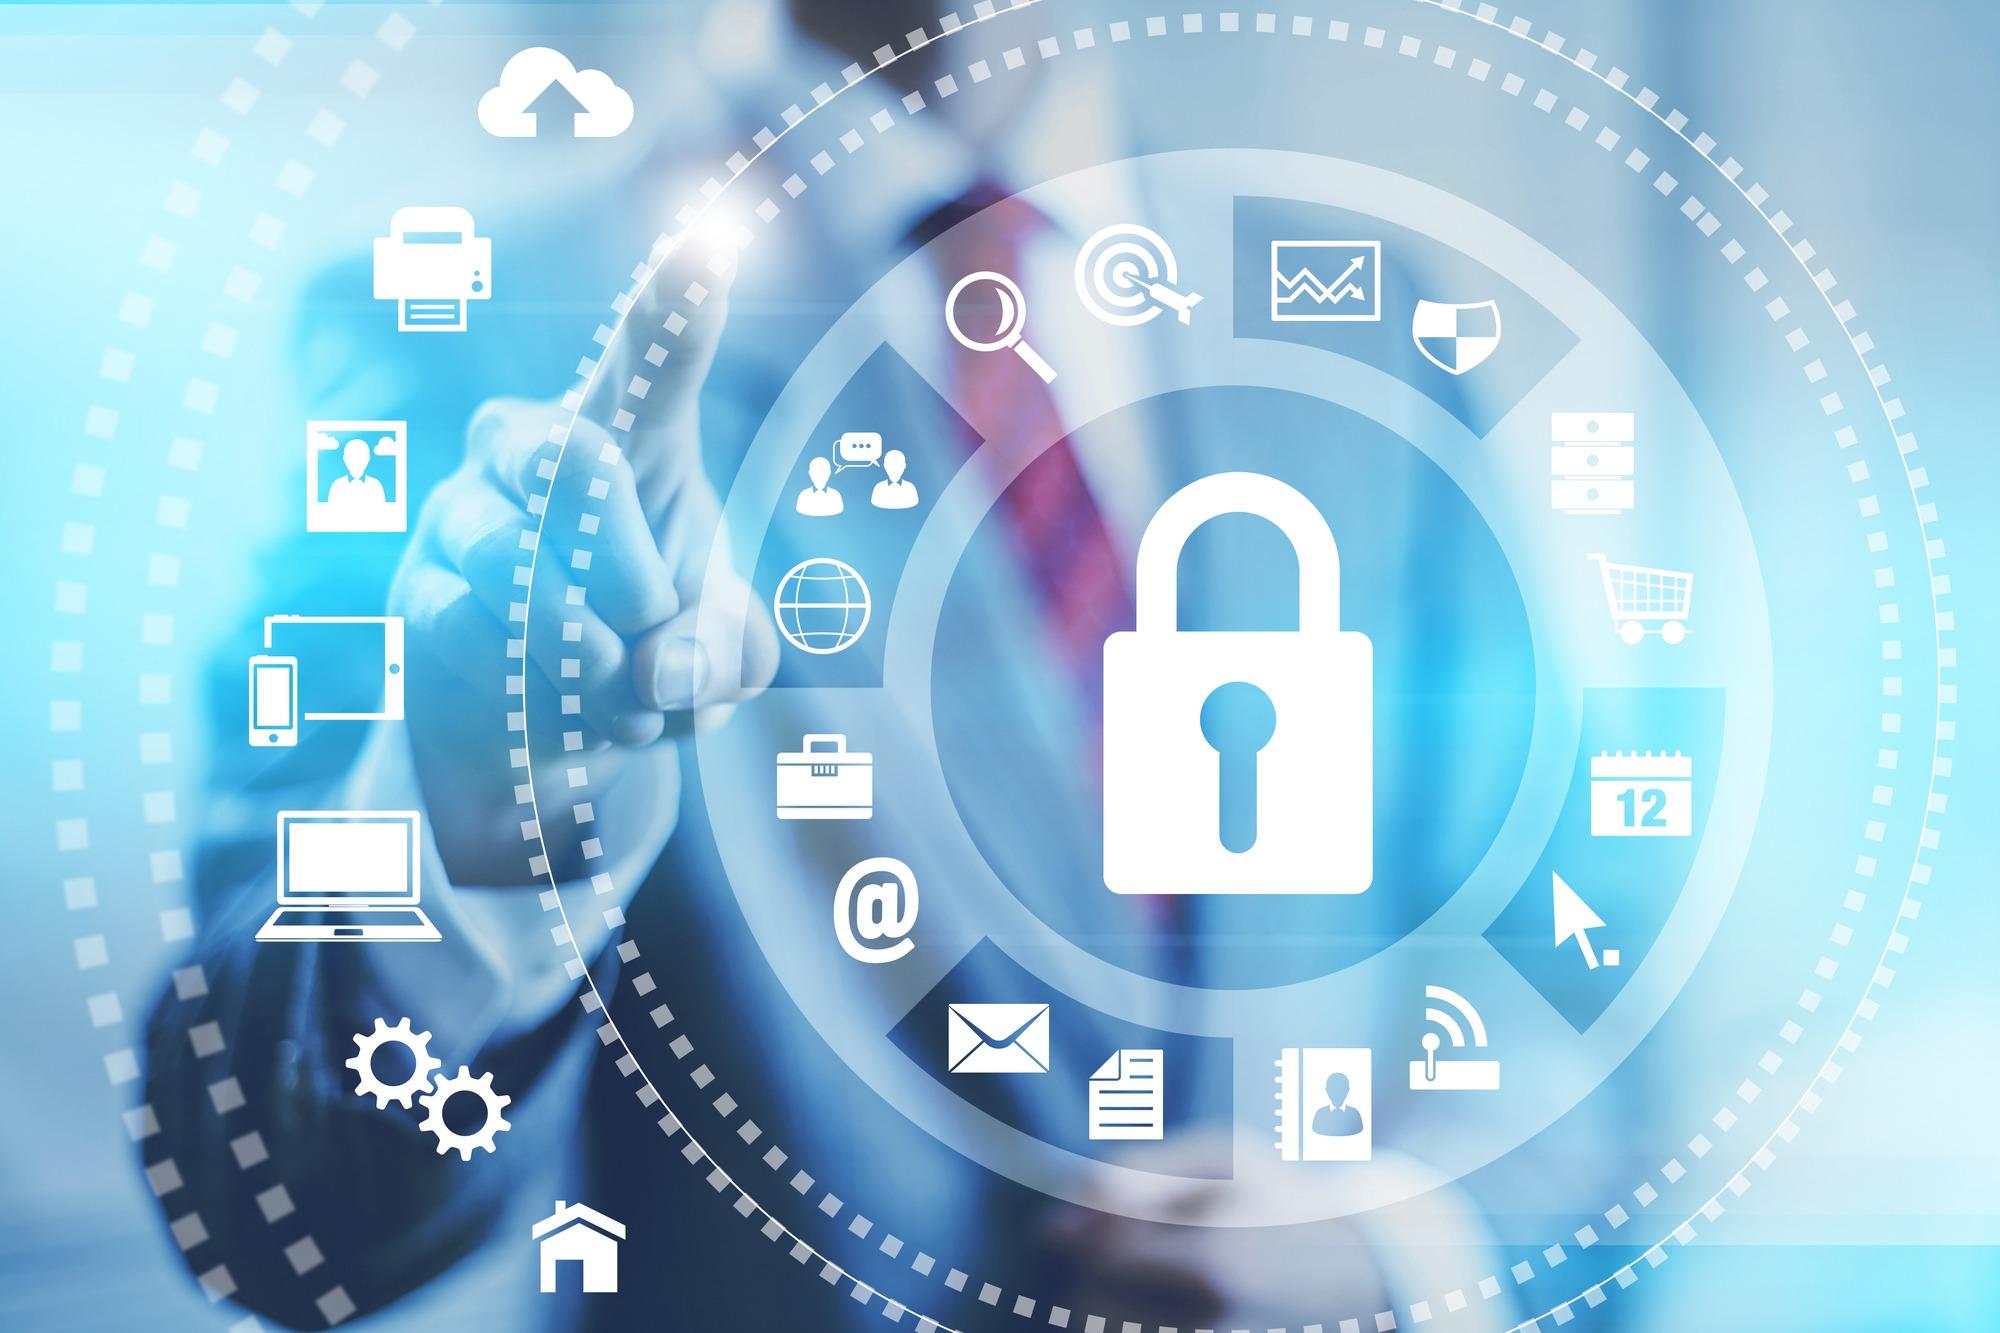 Technical Security Services | C3IA